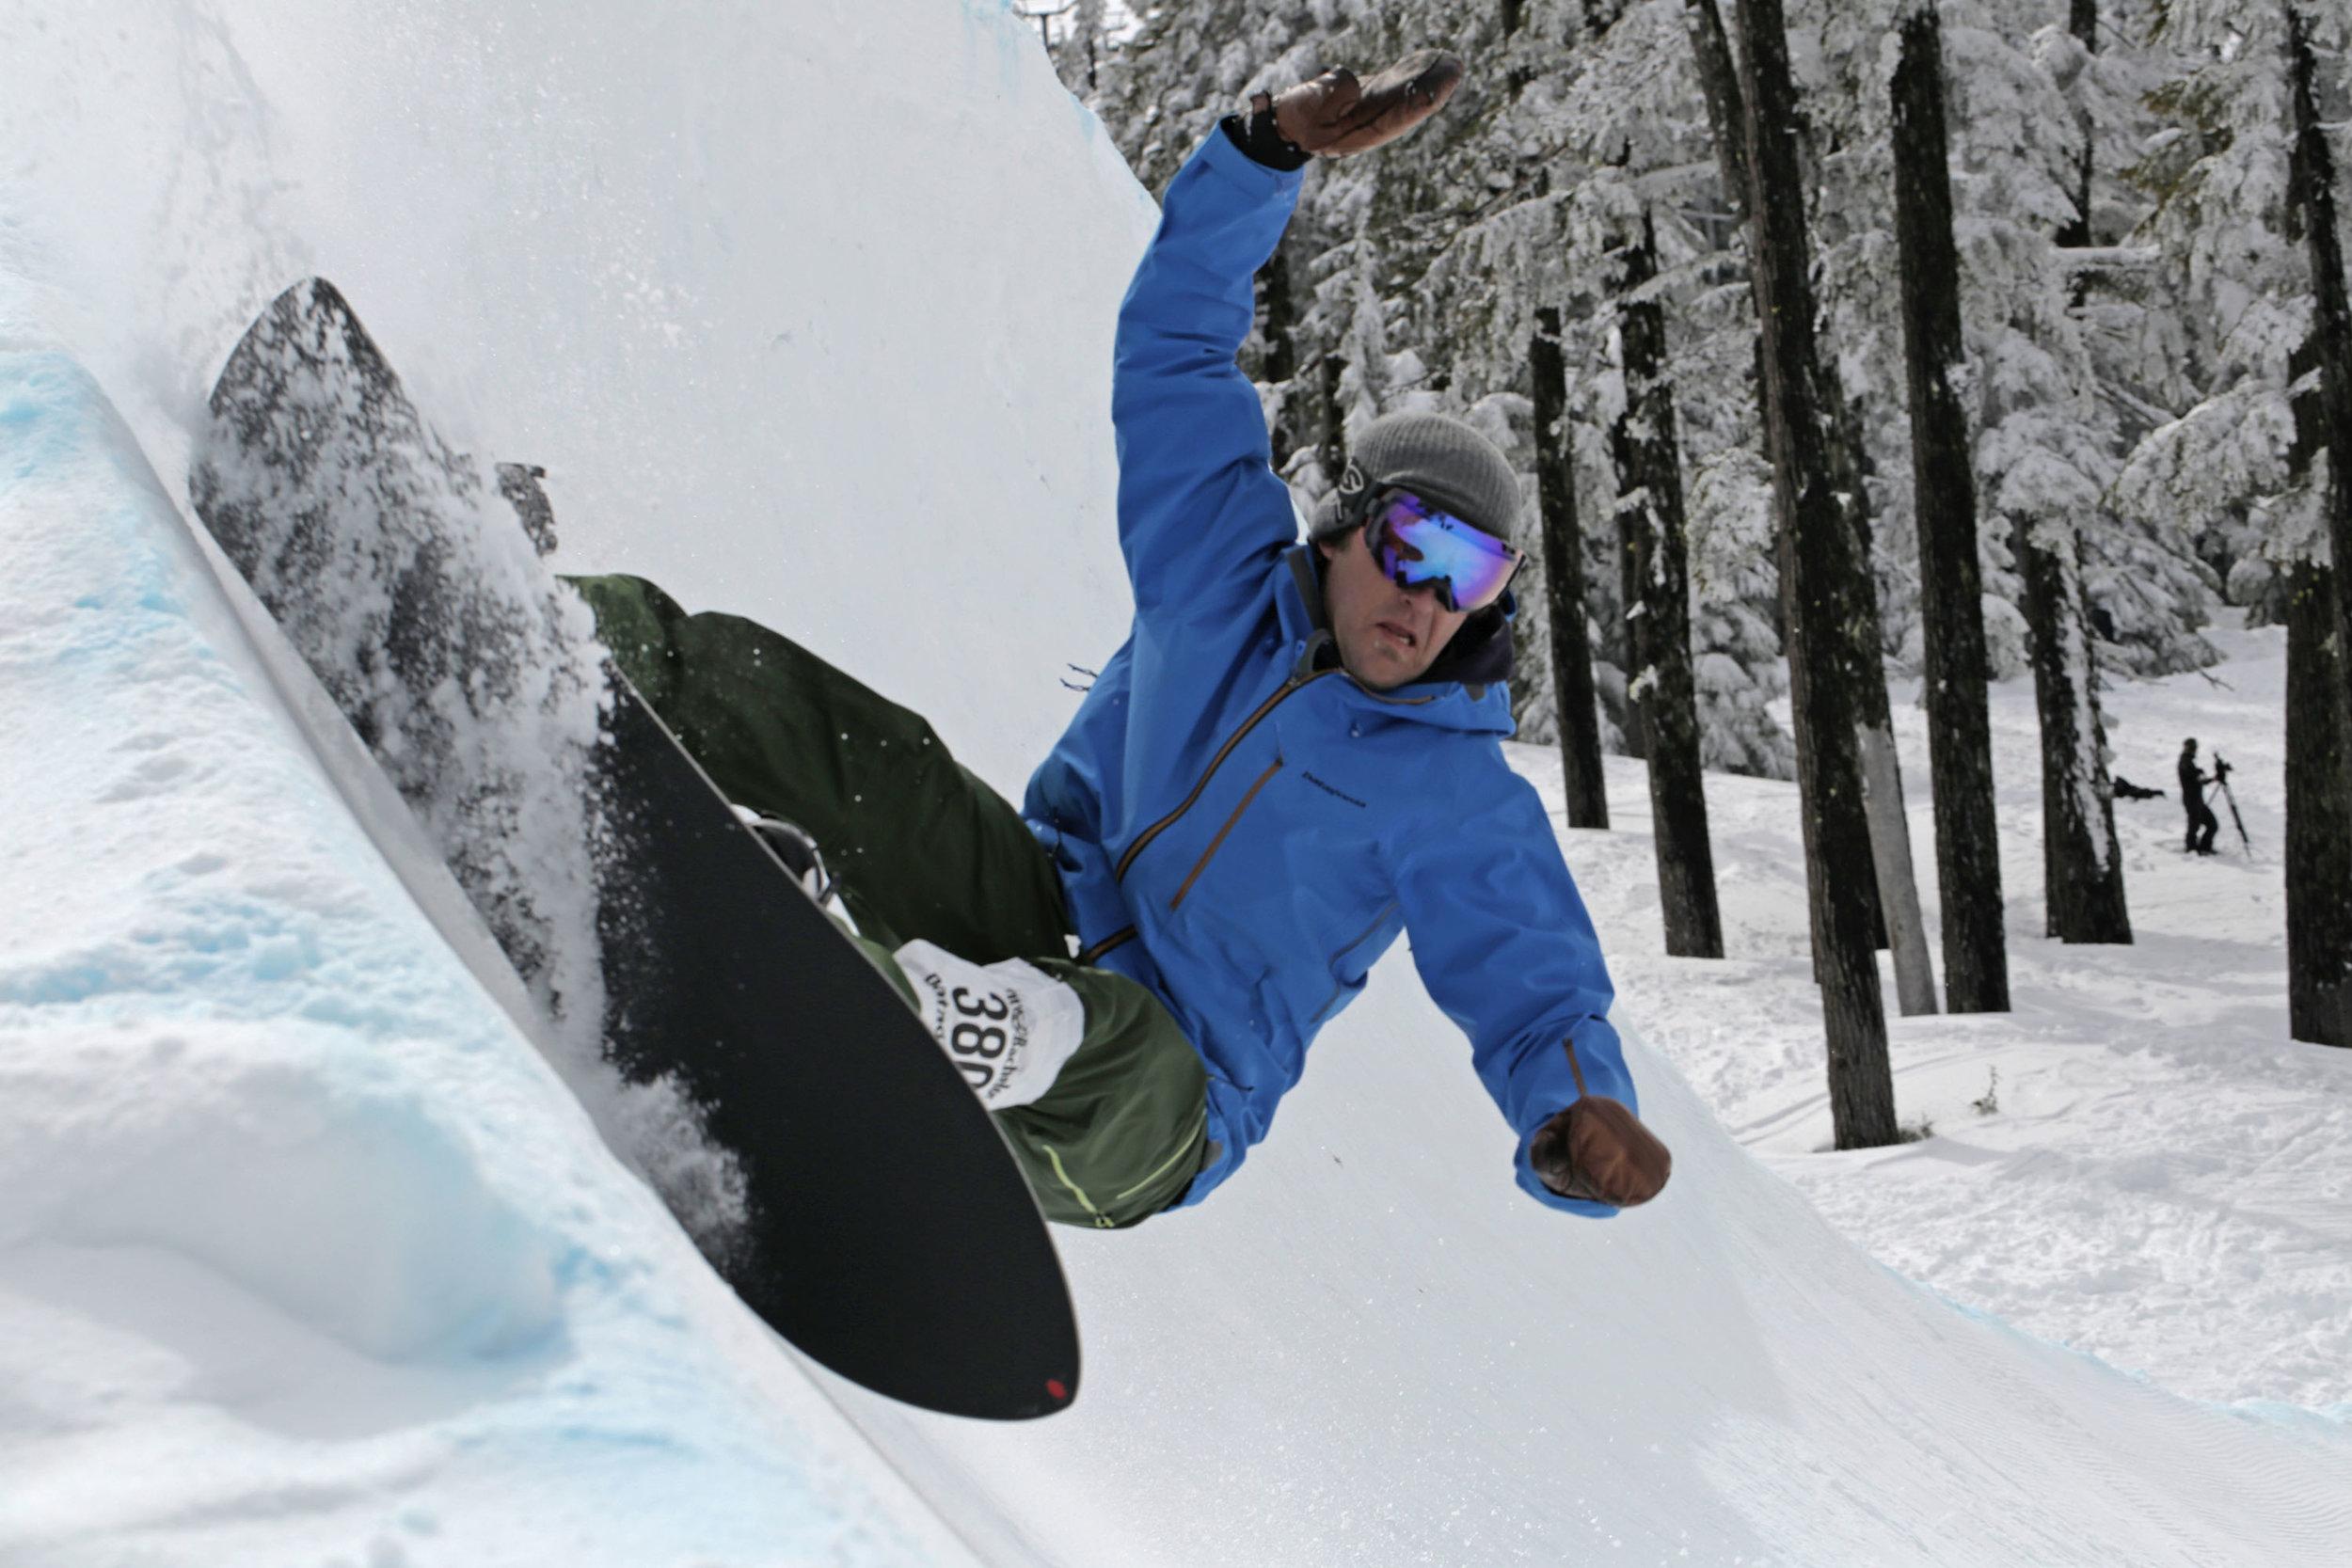 Joe Curren displaces both frozen and liquid water in fine form. Photo:Jason McFarlane